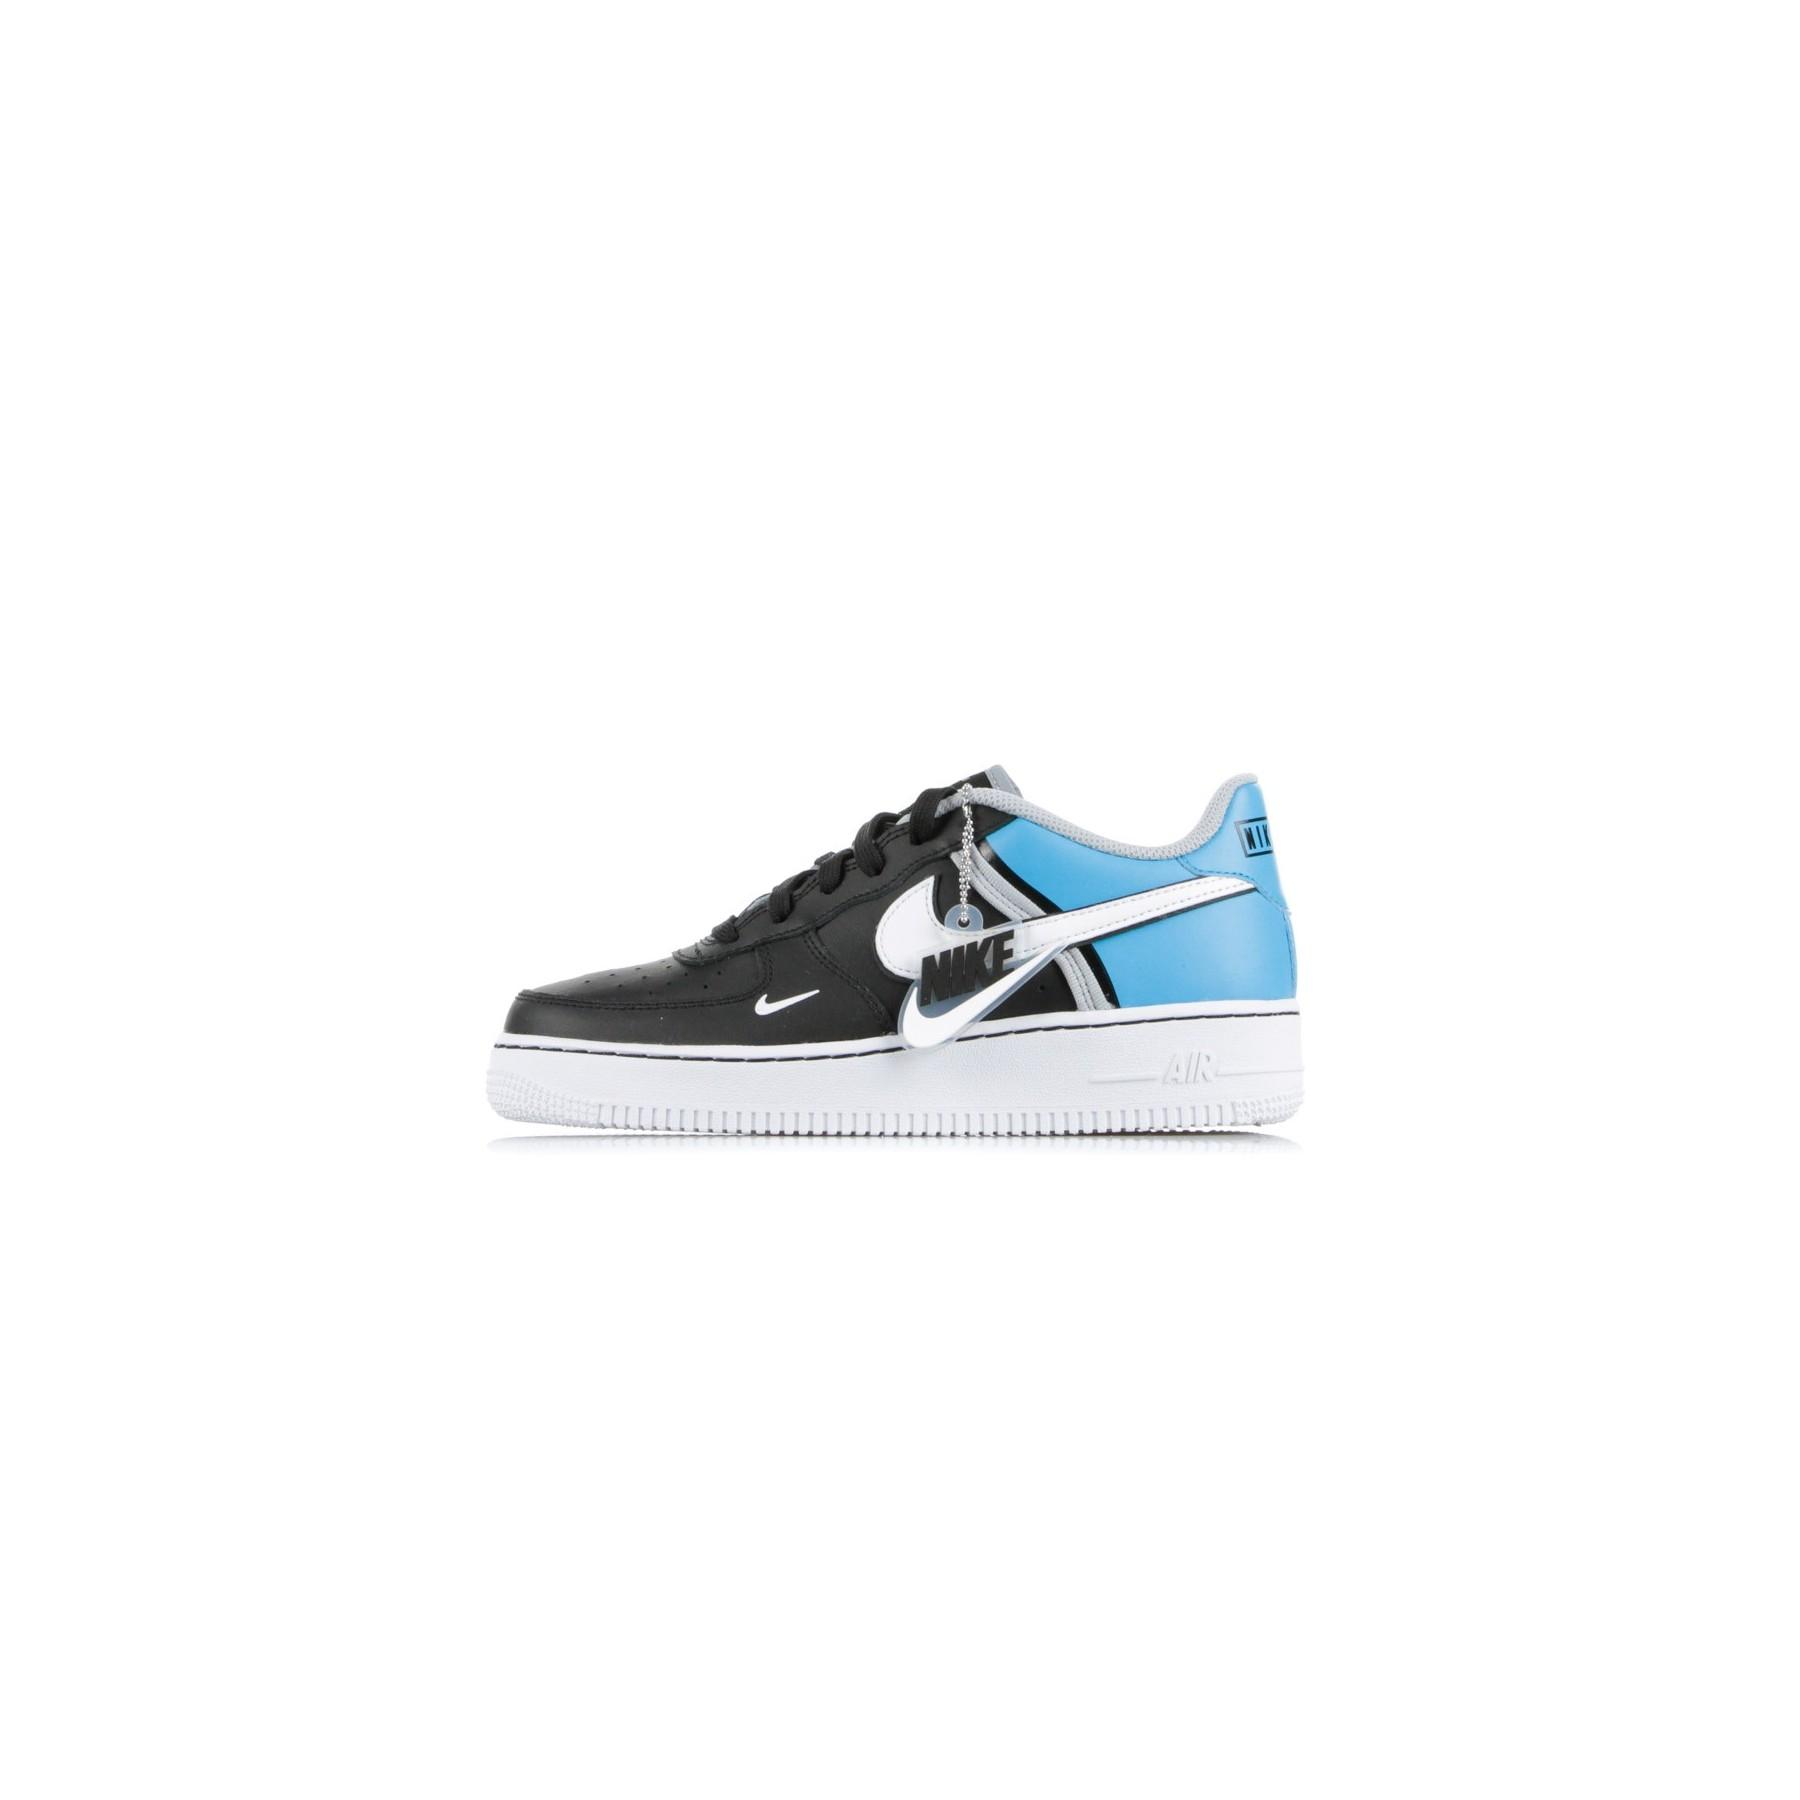 Nike Scarpa bassa bambino air force 1 lv8 2 (gs) CI1756-001 | Atipi...